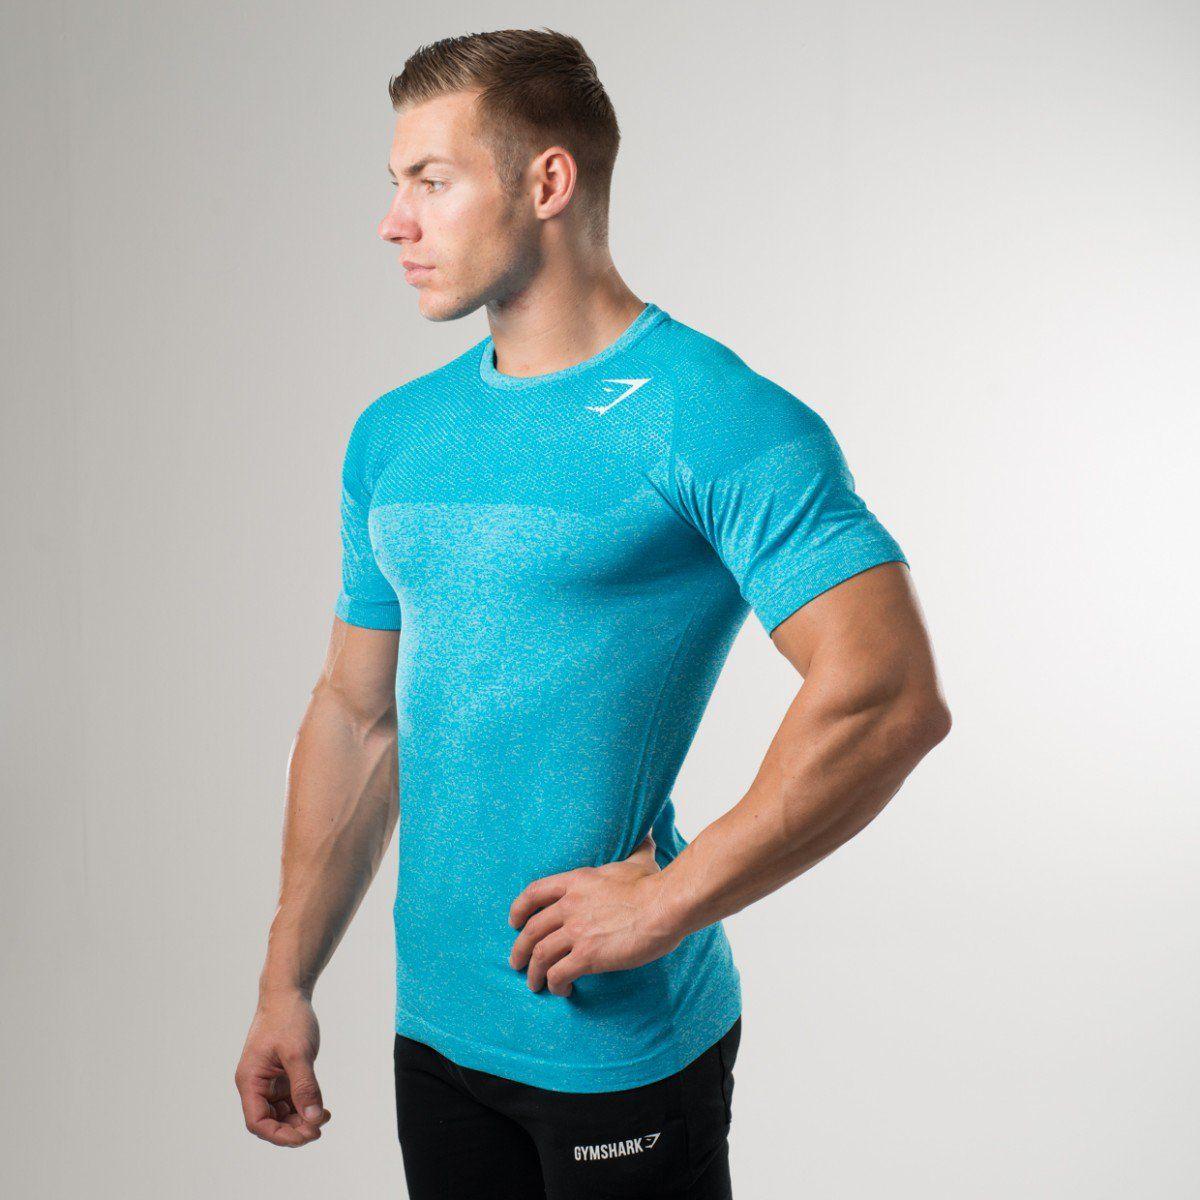 90db5ac5f8b5d Gymshark Phantom Seamless T-Shirt - Blue - New Releases - Featured - Mens